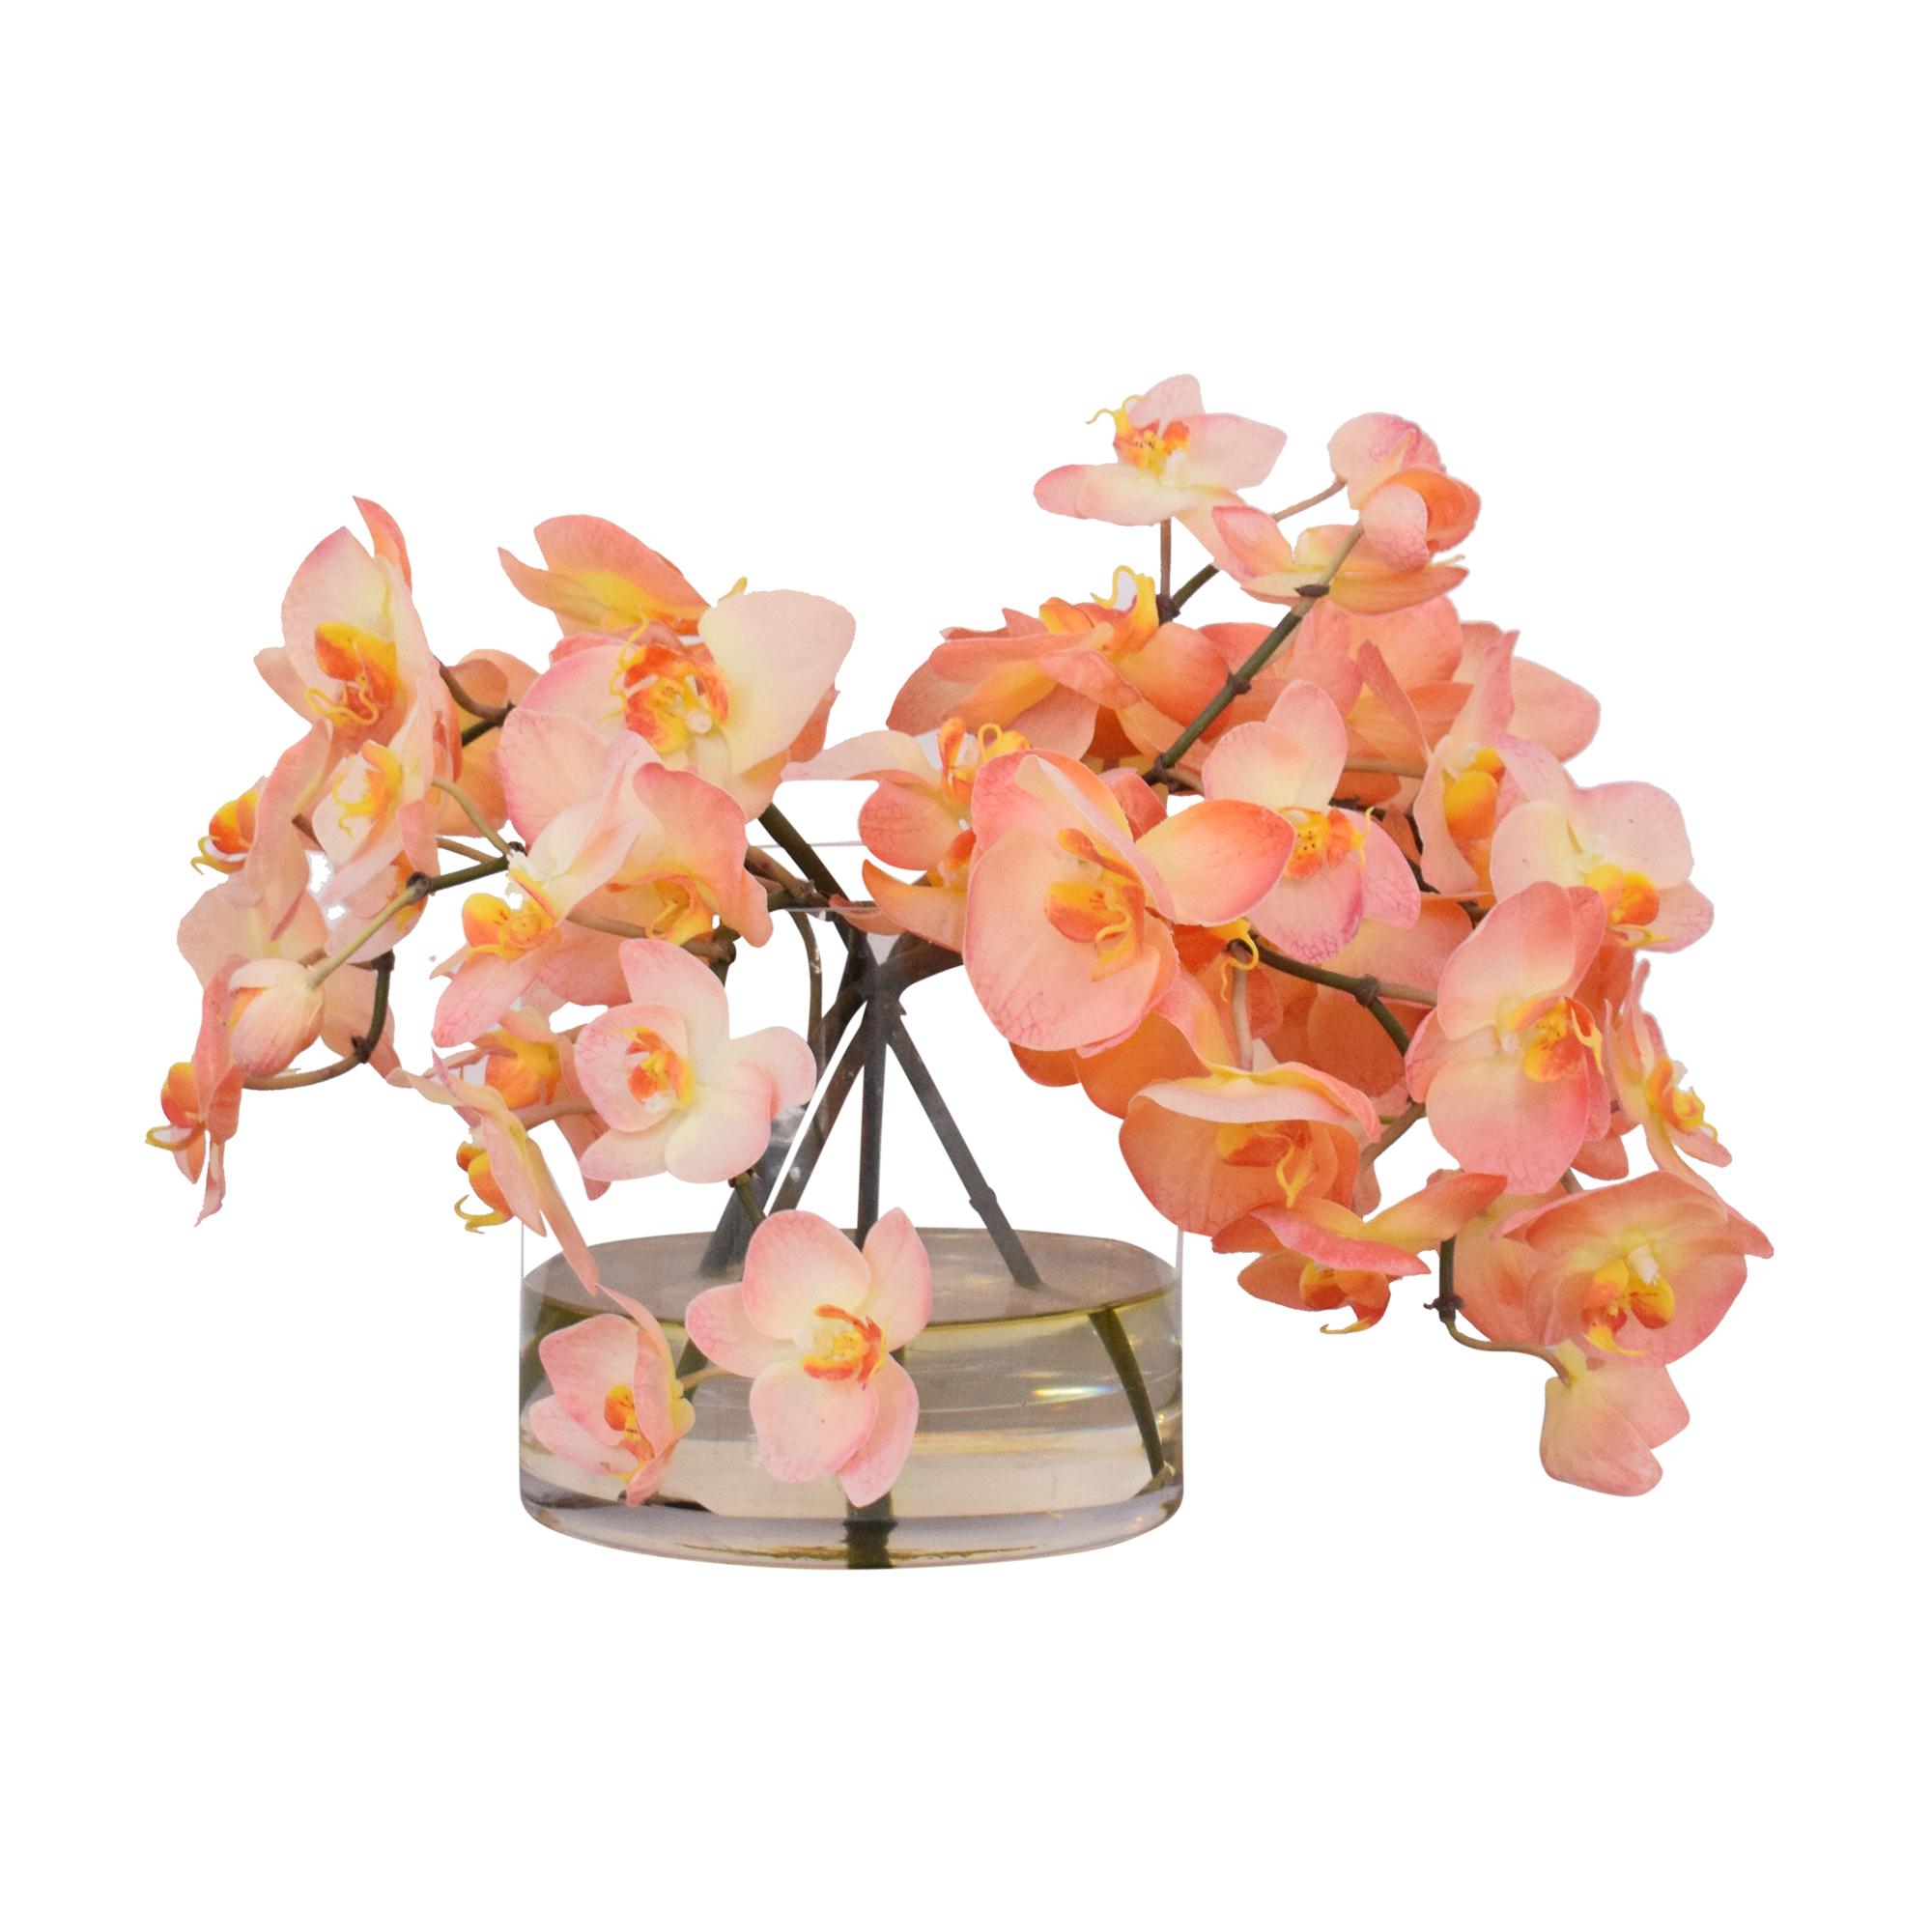 Ethan Allen Ethan Allen Decorative Vase of Orchids second hand